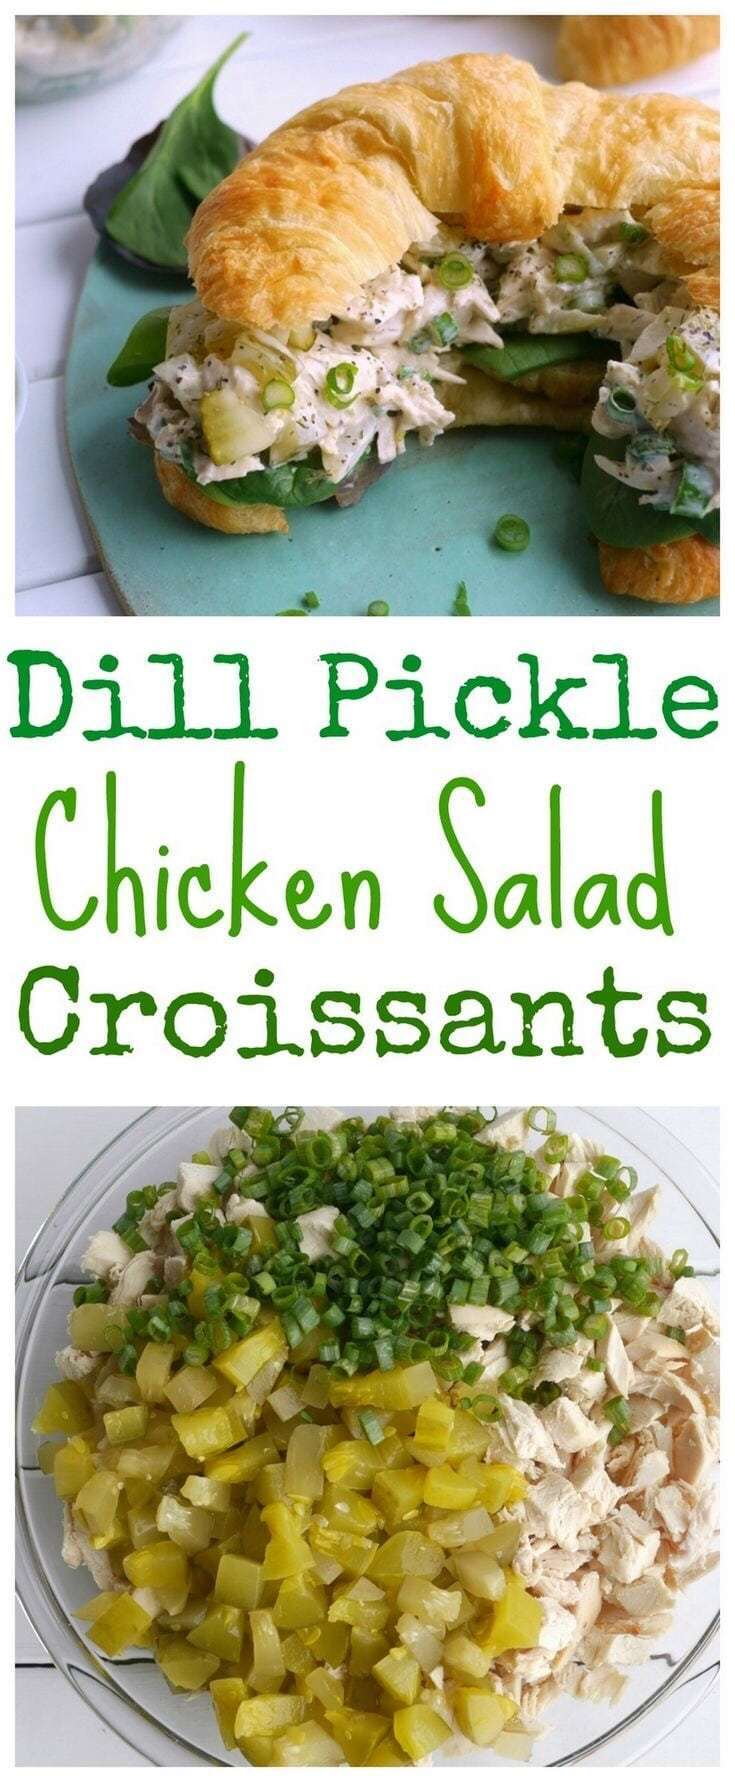 Dill Pickle Chicken Salad Croissants - - 20 Best Croissant Sandwich Recipes